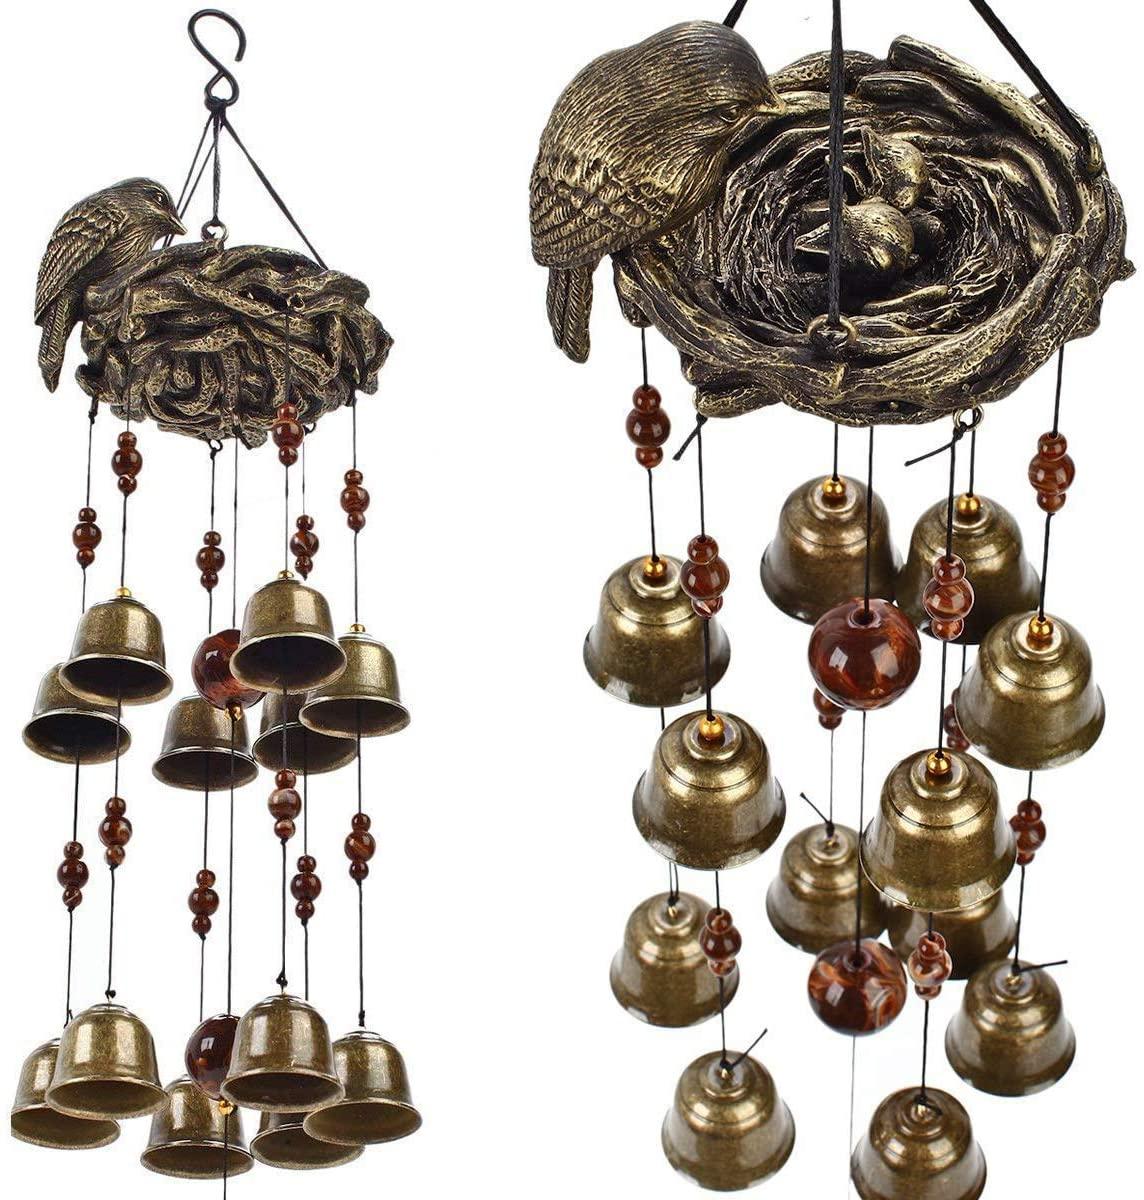 MEIHONG Outdoor Wind Chimes, Bird Nest Bronze Wind Chimes Unique Outdoor, Birds and Nest Windchime 12pieces Wind Bells, Bird Garden Decor, Hanging Wind Chime Bell, Best Musical Wind Chime